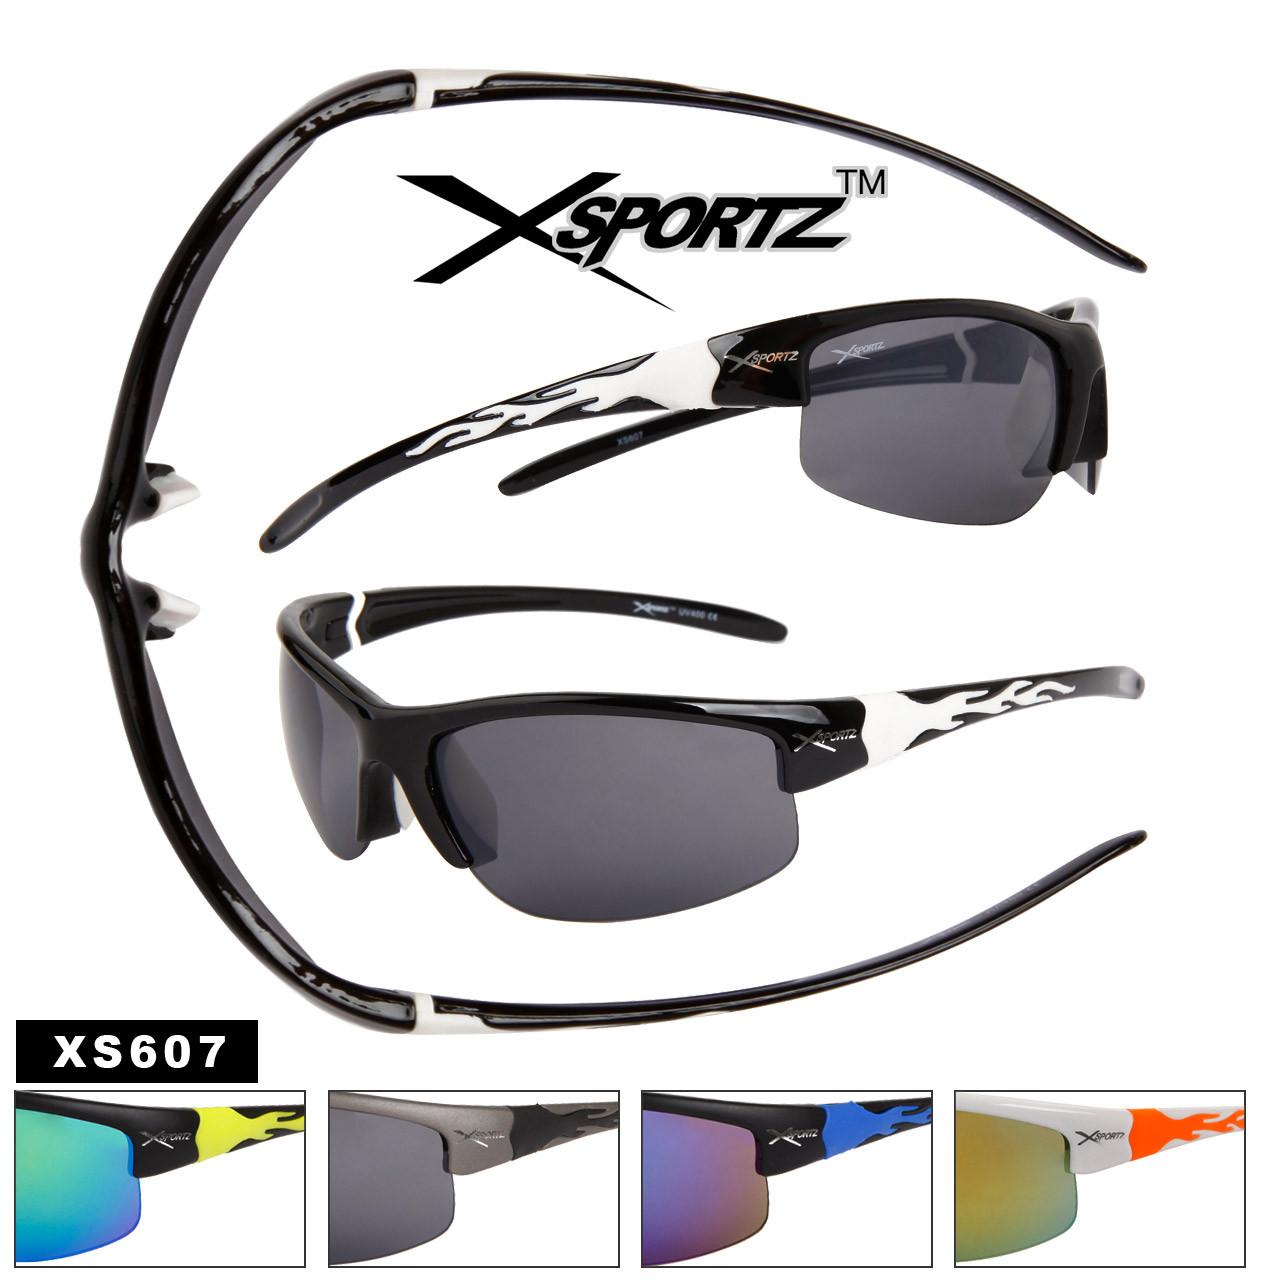 Xsportz™Wholesale Sports Sunglasses - Style # XS607